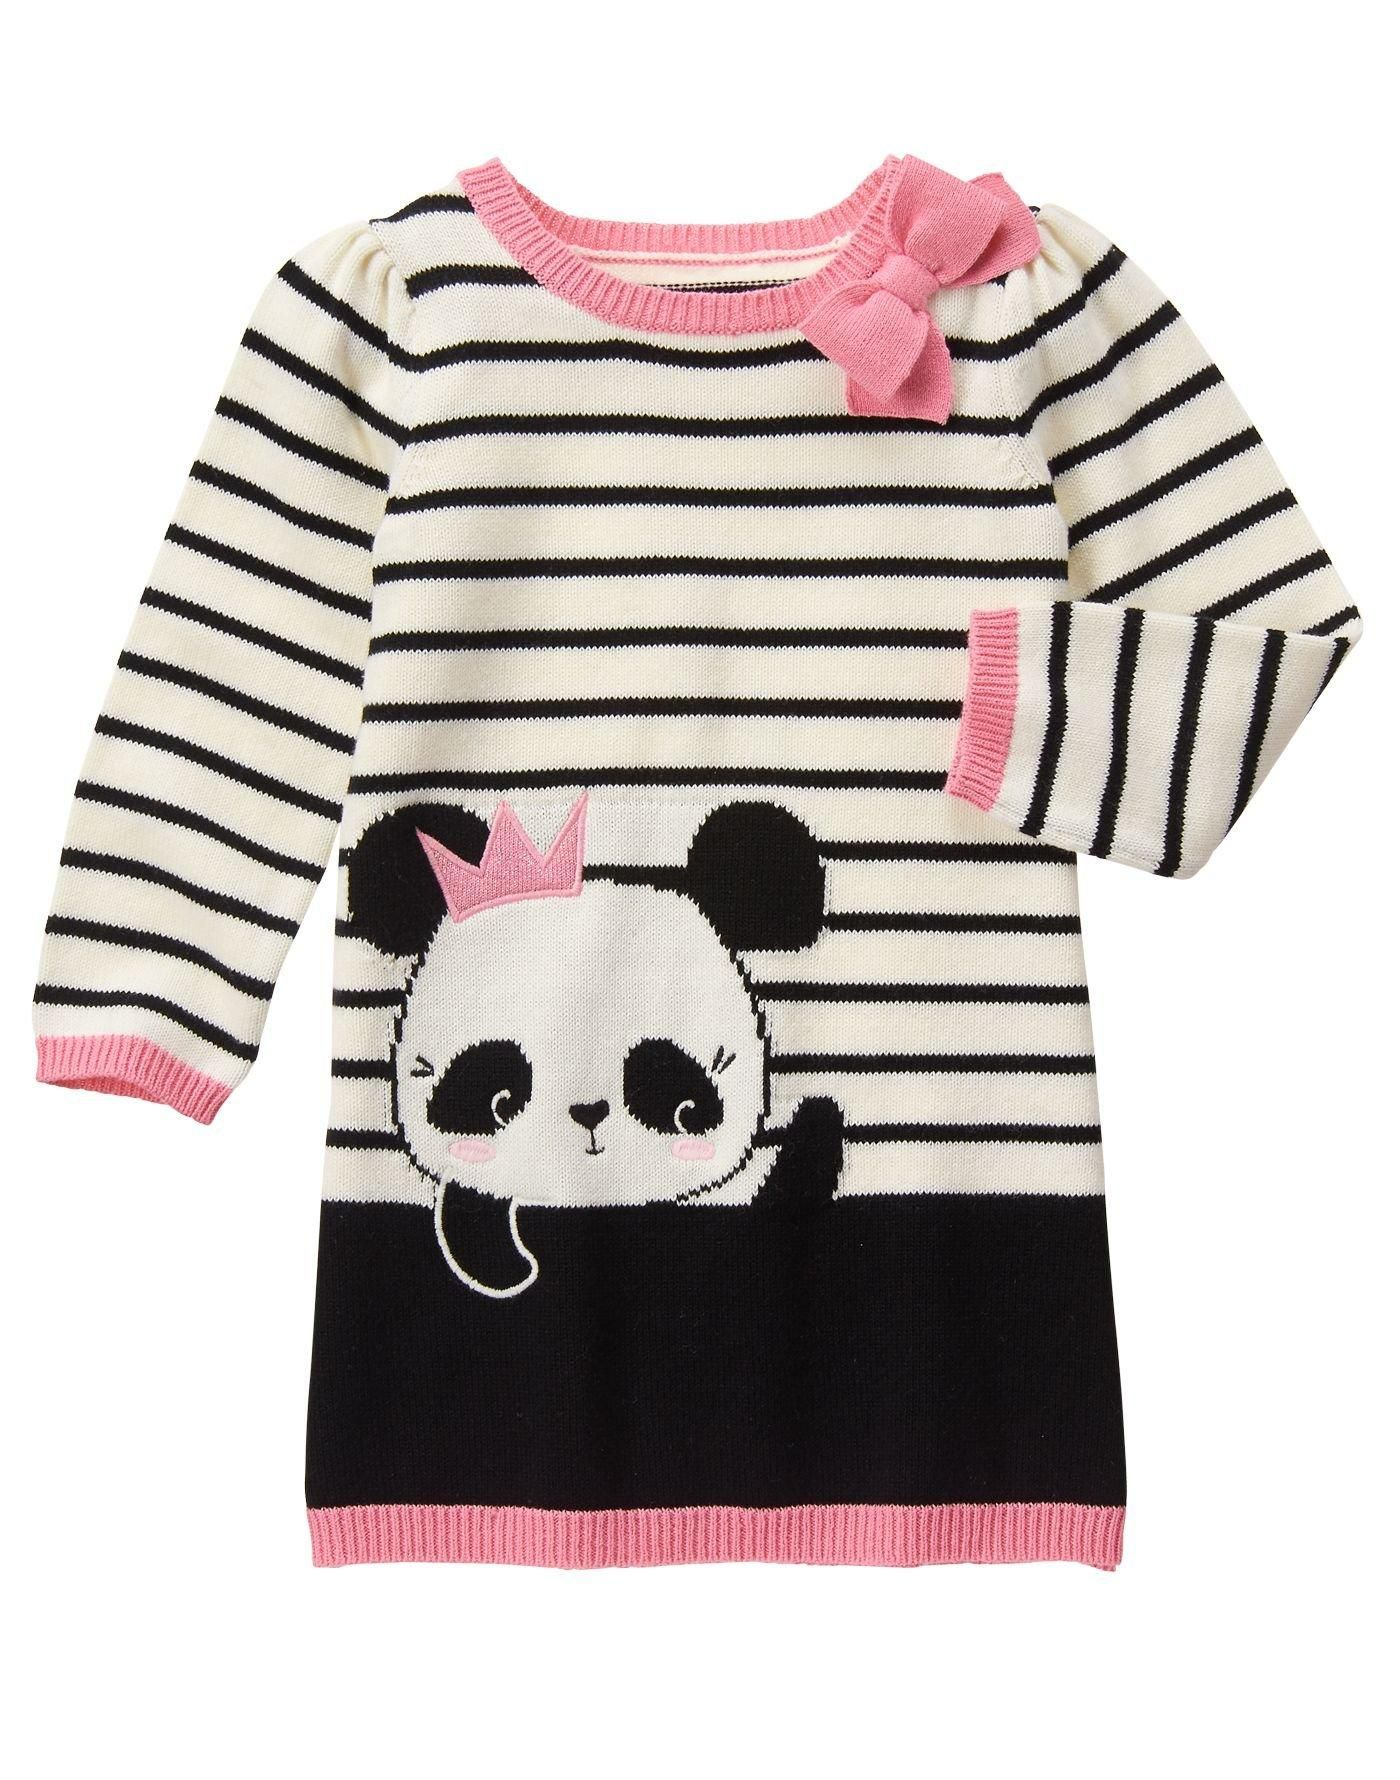 059f0f4d252 Panda Sweater Dress   Fall 2016   Dresses, Sweaters, Toddler sweater